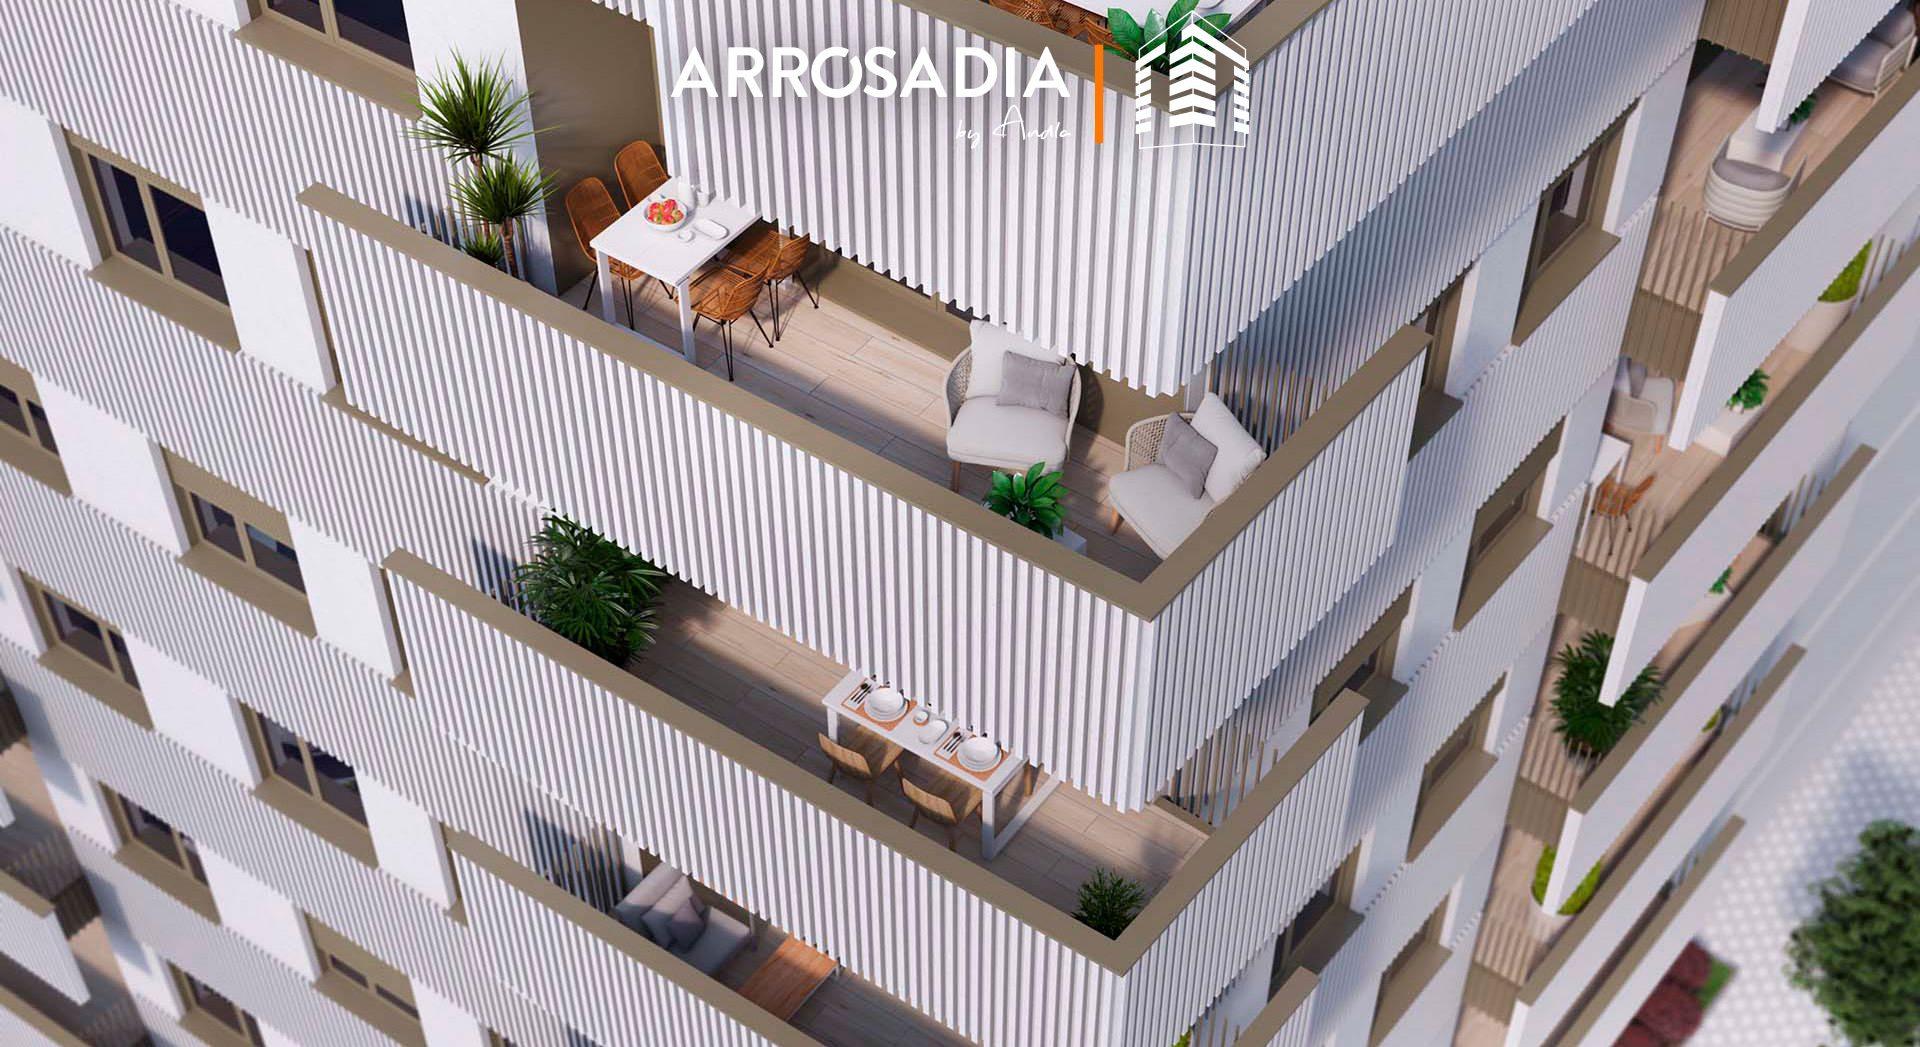 ANDIA_ARROSADIA_TERRAZAS-slide-1920x1047